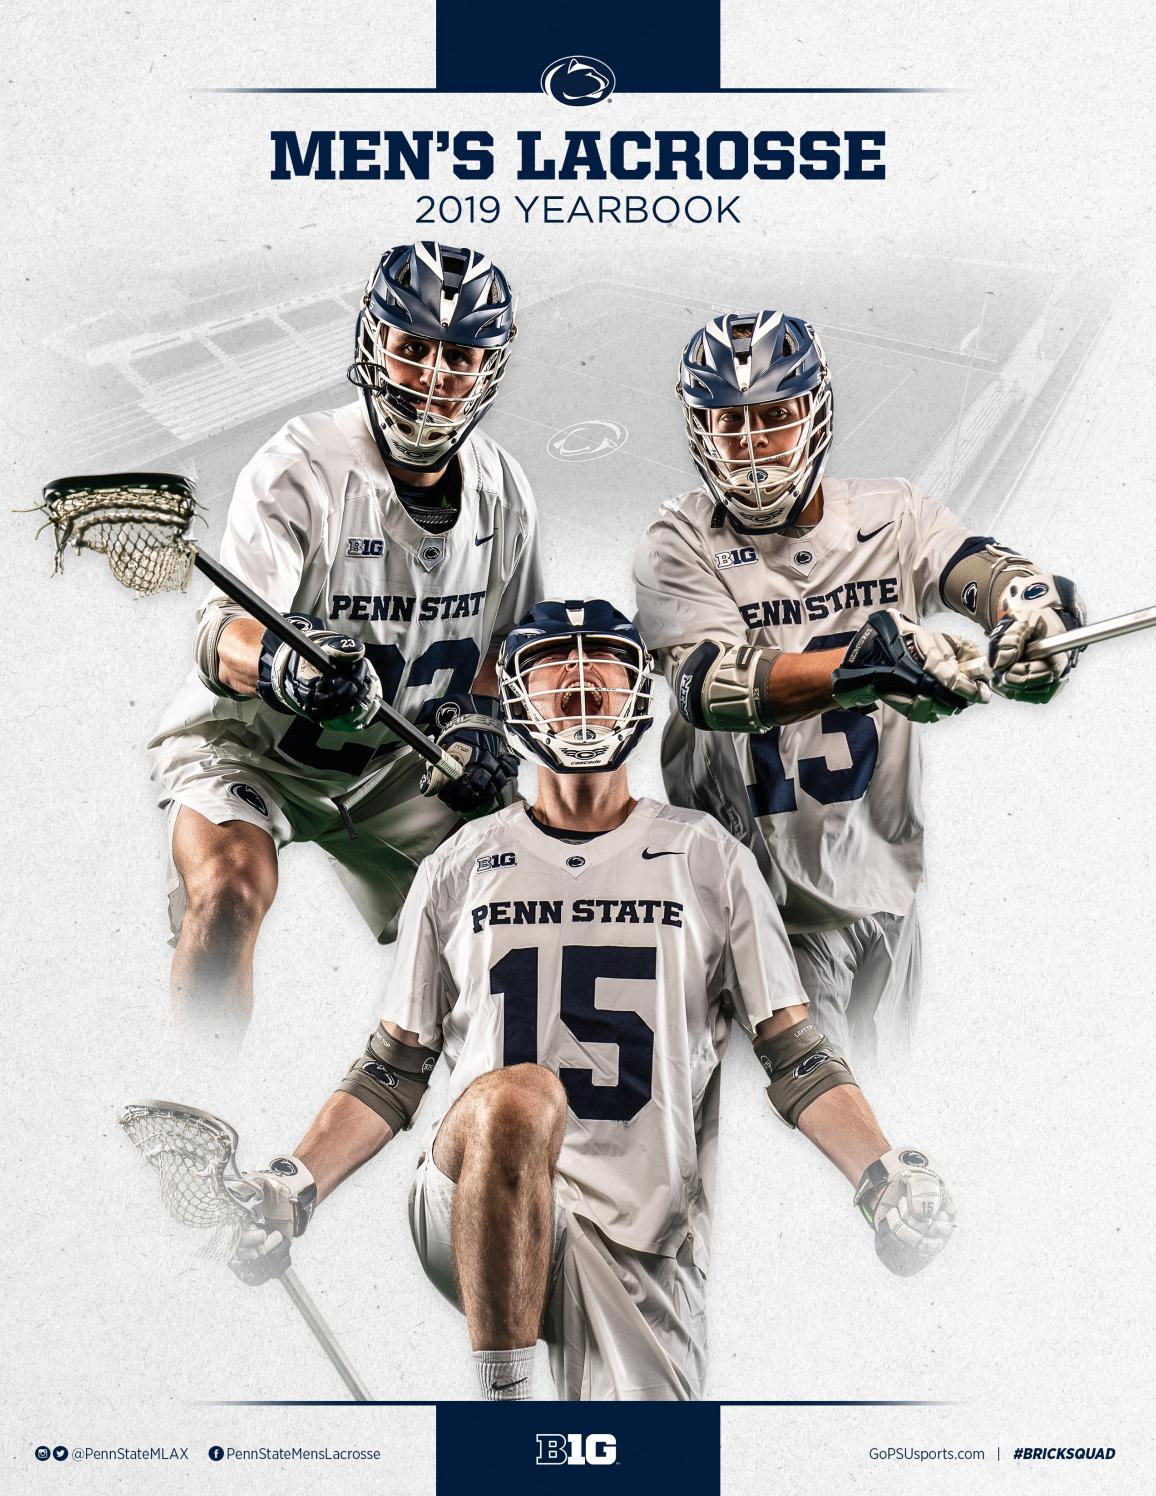 2019 penn state men s lacrosse yearbook by penn state athletics issuu 2019 penn state men s lacrosse yearbook